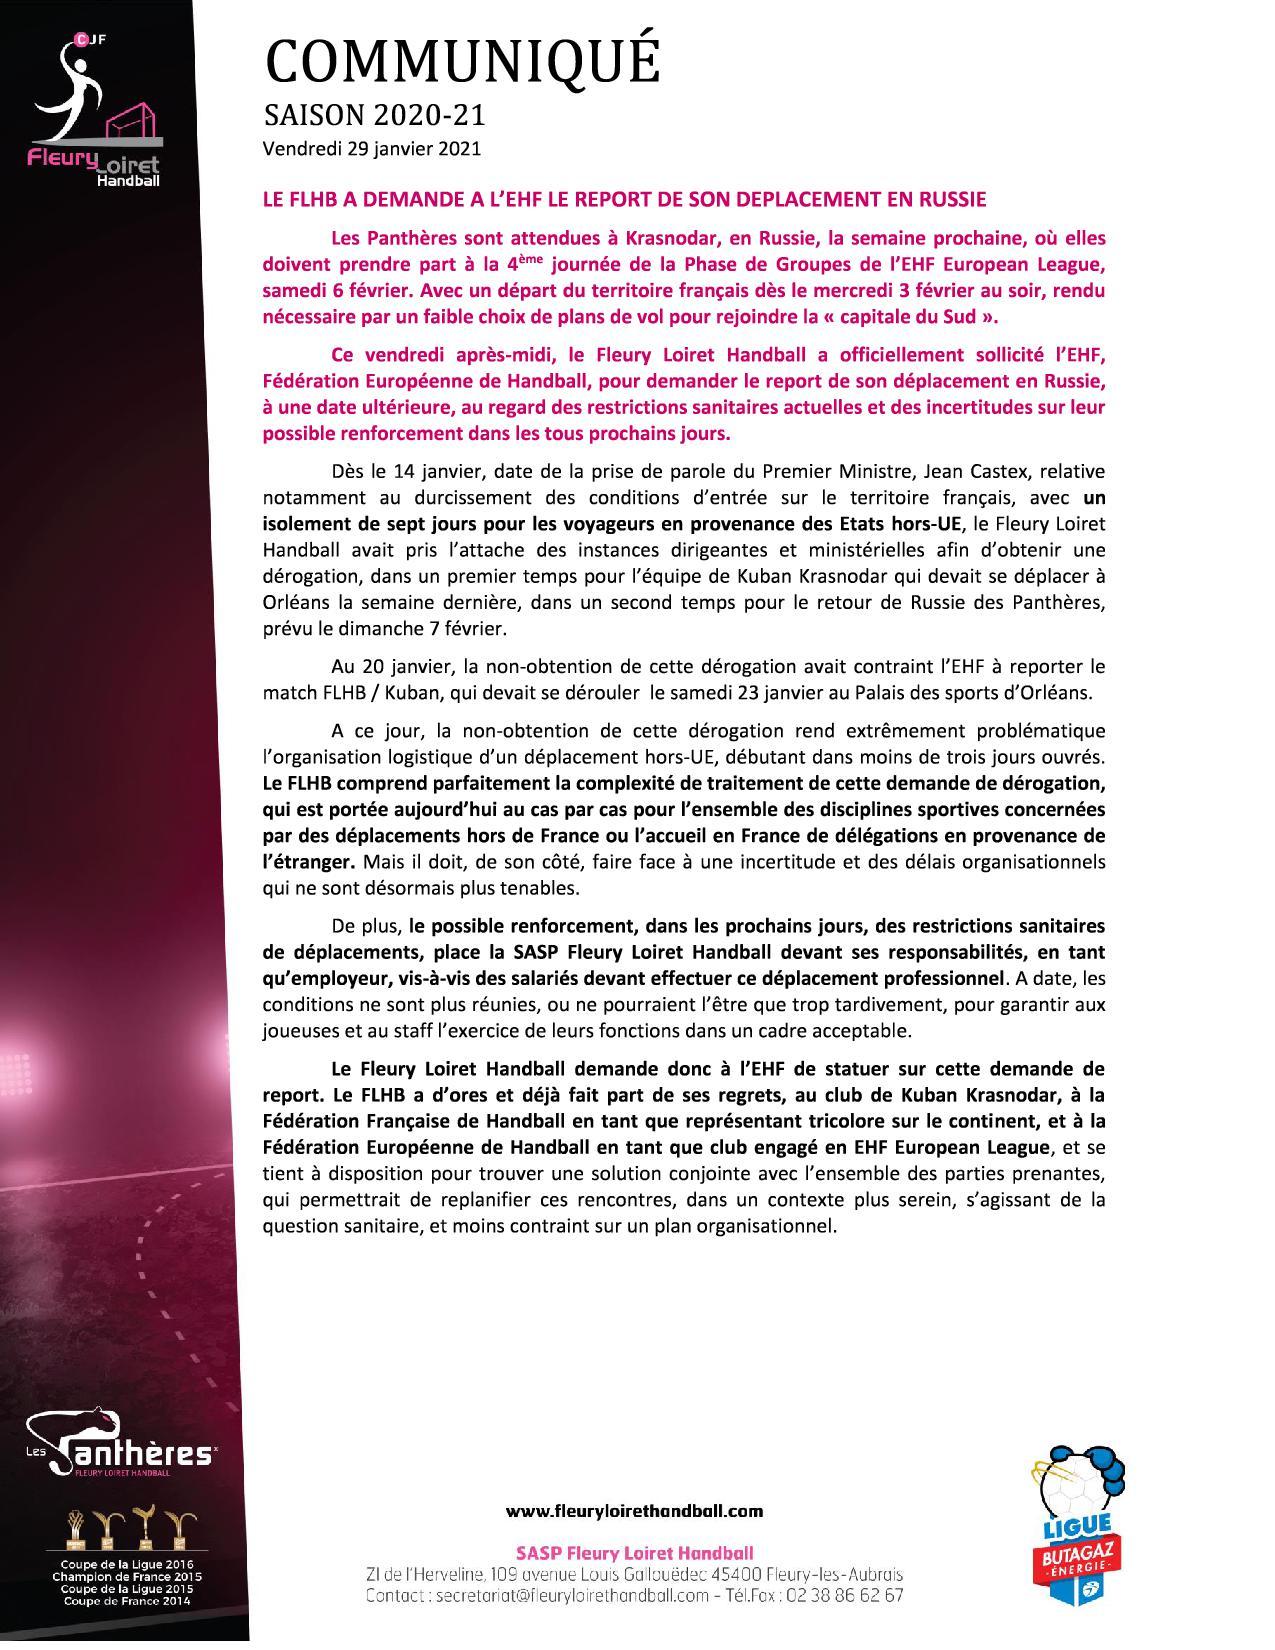 Communiqué Fleury Loiret Handball - Vendredi 29 janvier 2021.jpg